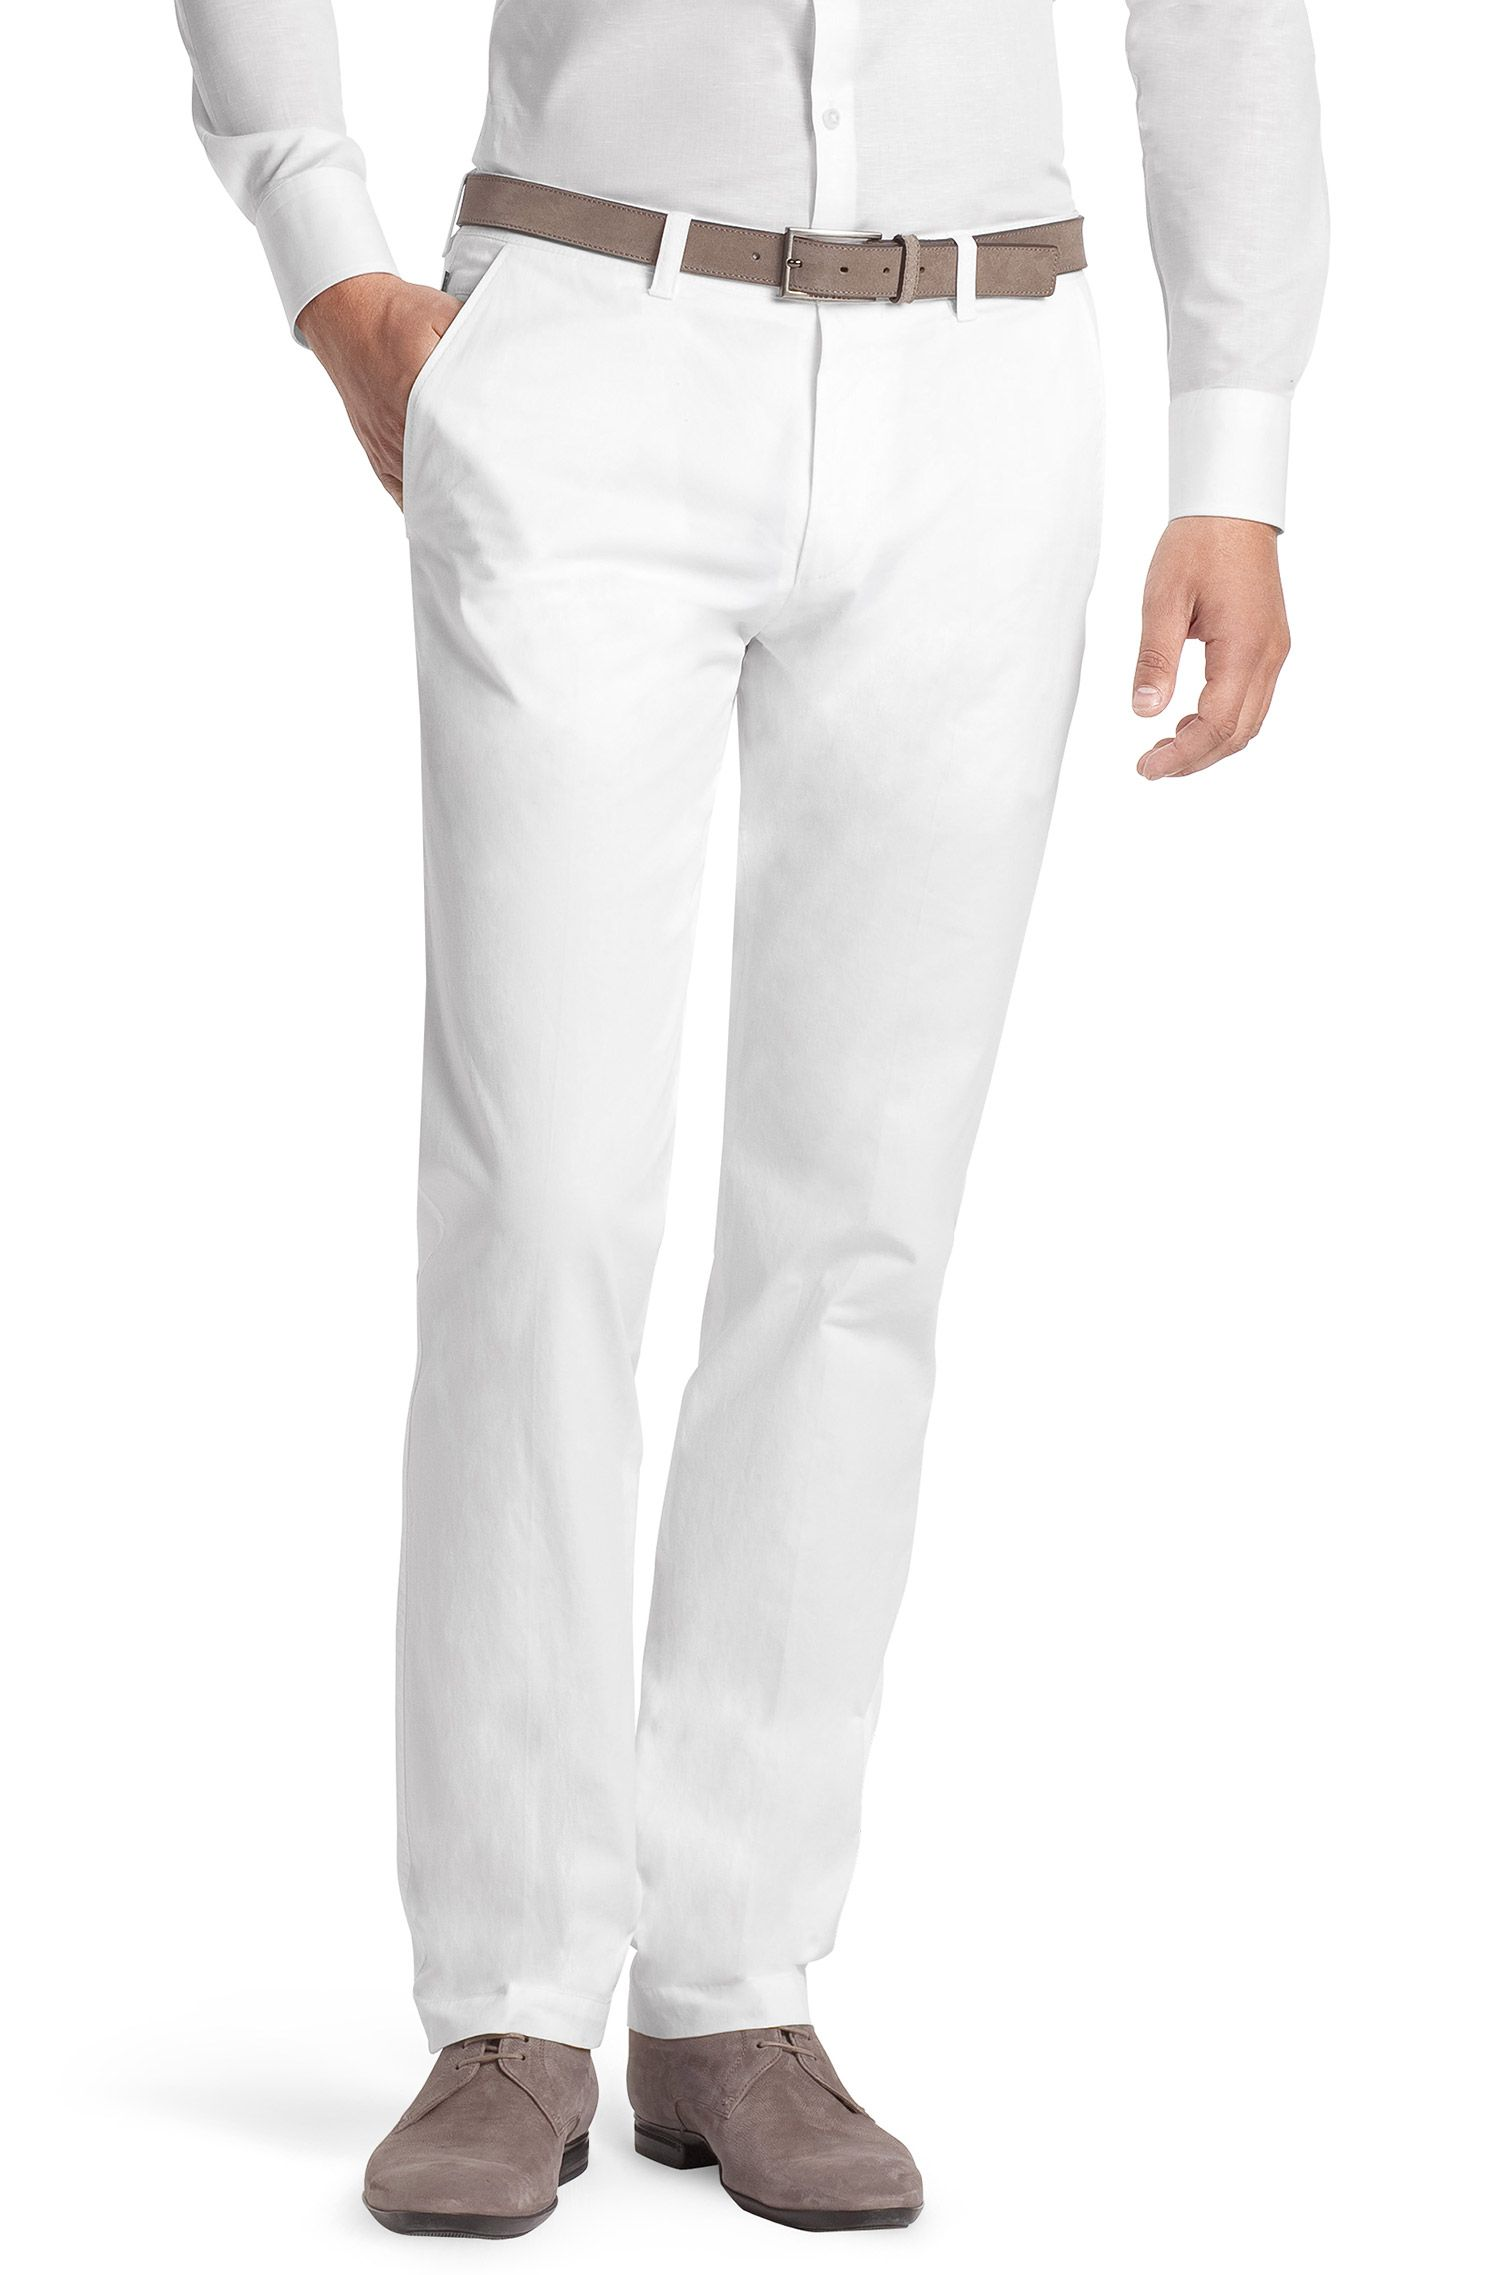 Pantalon détente en coton, Shadow4-W